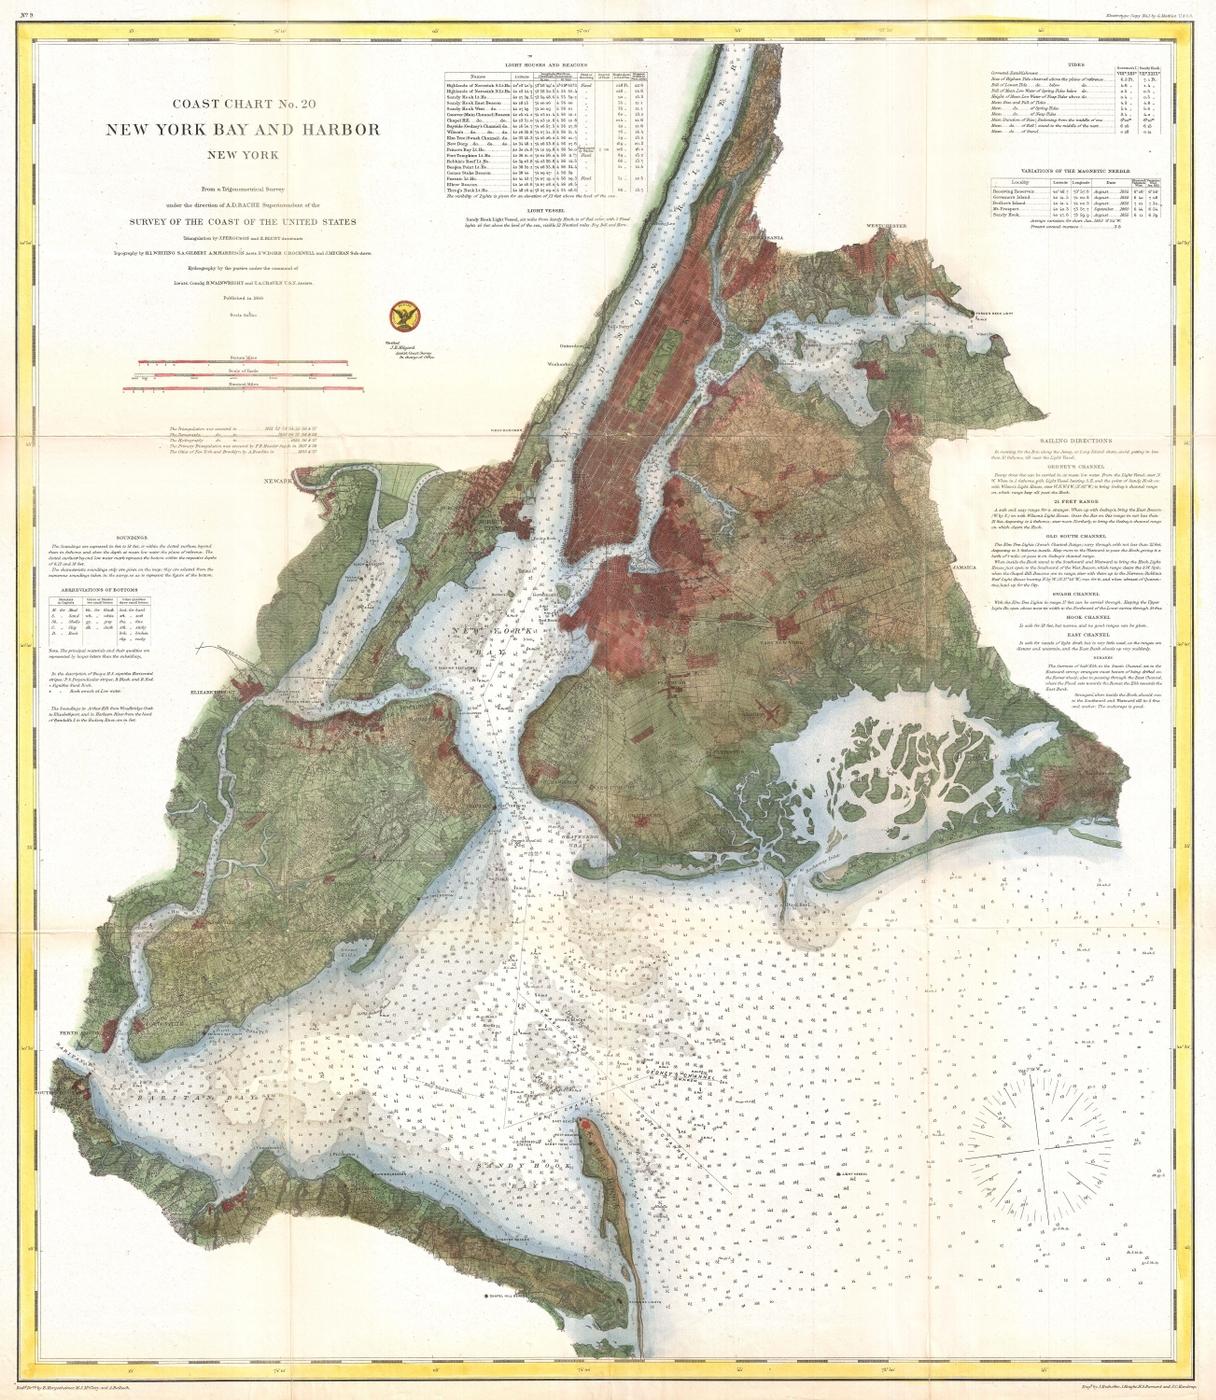 [map] [new york] 1866_U.S._Coast_Survey_Nautical_Chart_of_Map_of_New_York_City_and_Harbor_-_Geographicus_-_NewYorkCity3-uscs-1866